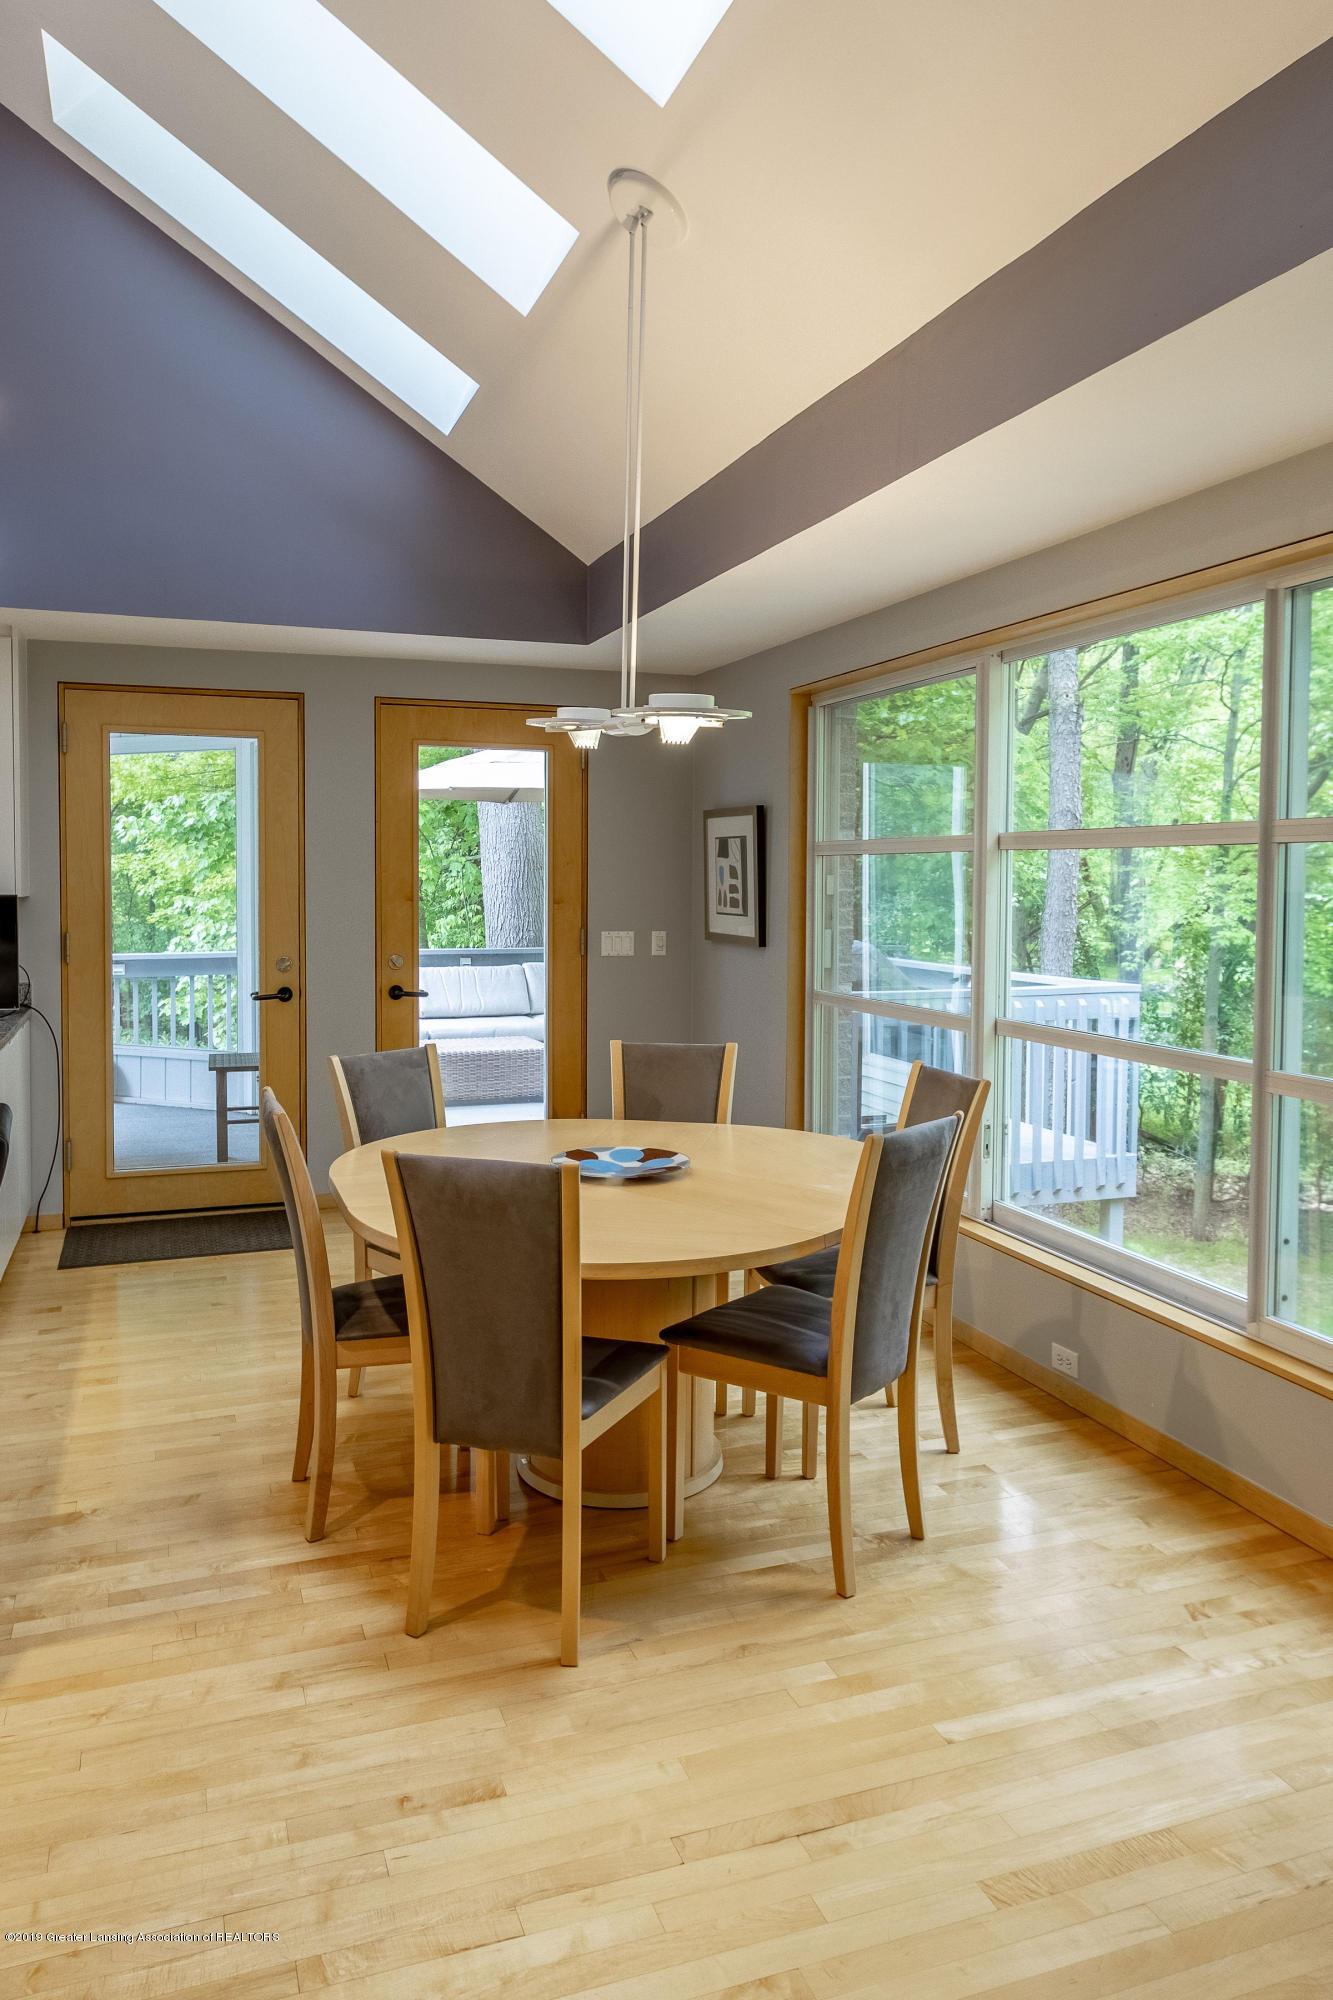 4435 Oak Pointe Ct - Kitchen Eating Area - 29